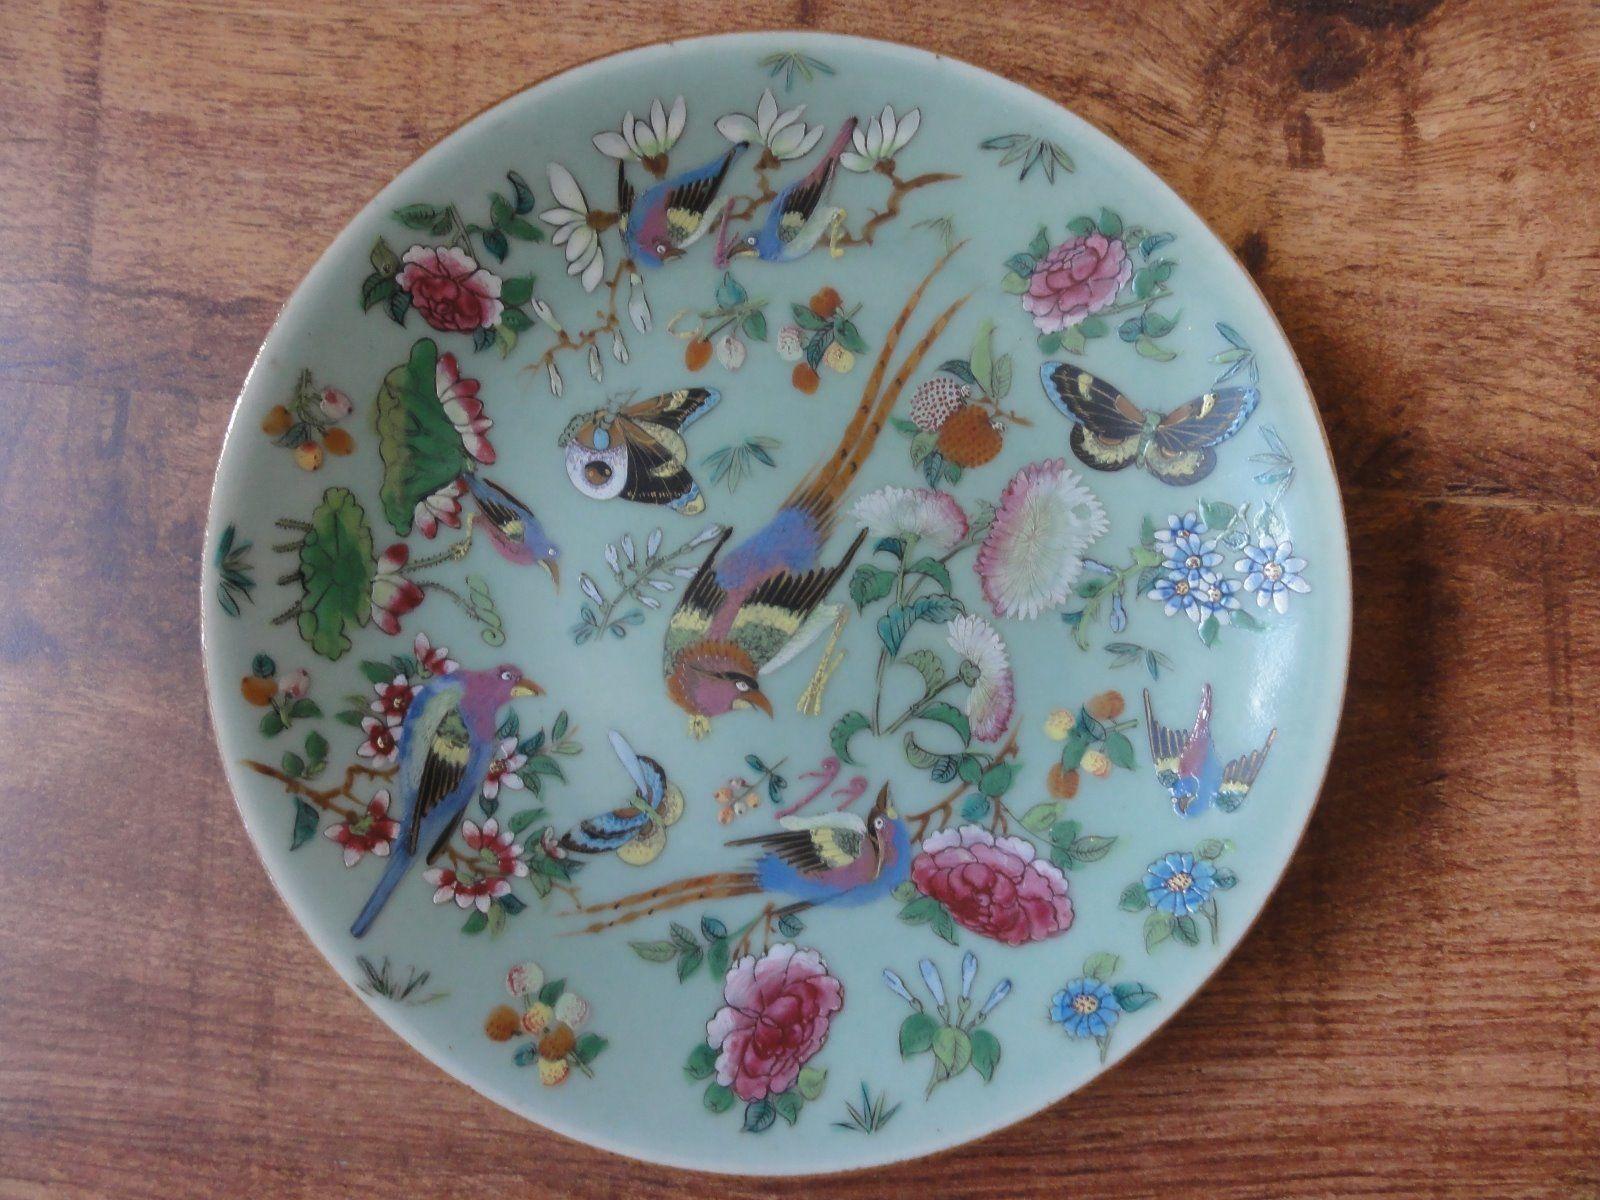 19th Century Chinese Porcelain Daoguang Mark Famille Rose 10 Plate Ebay Sale 39 00 Porcelain Art Chinese Porcelain Ceramic Vase